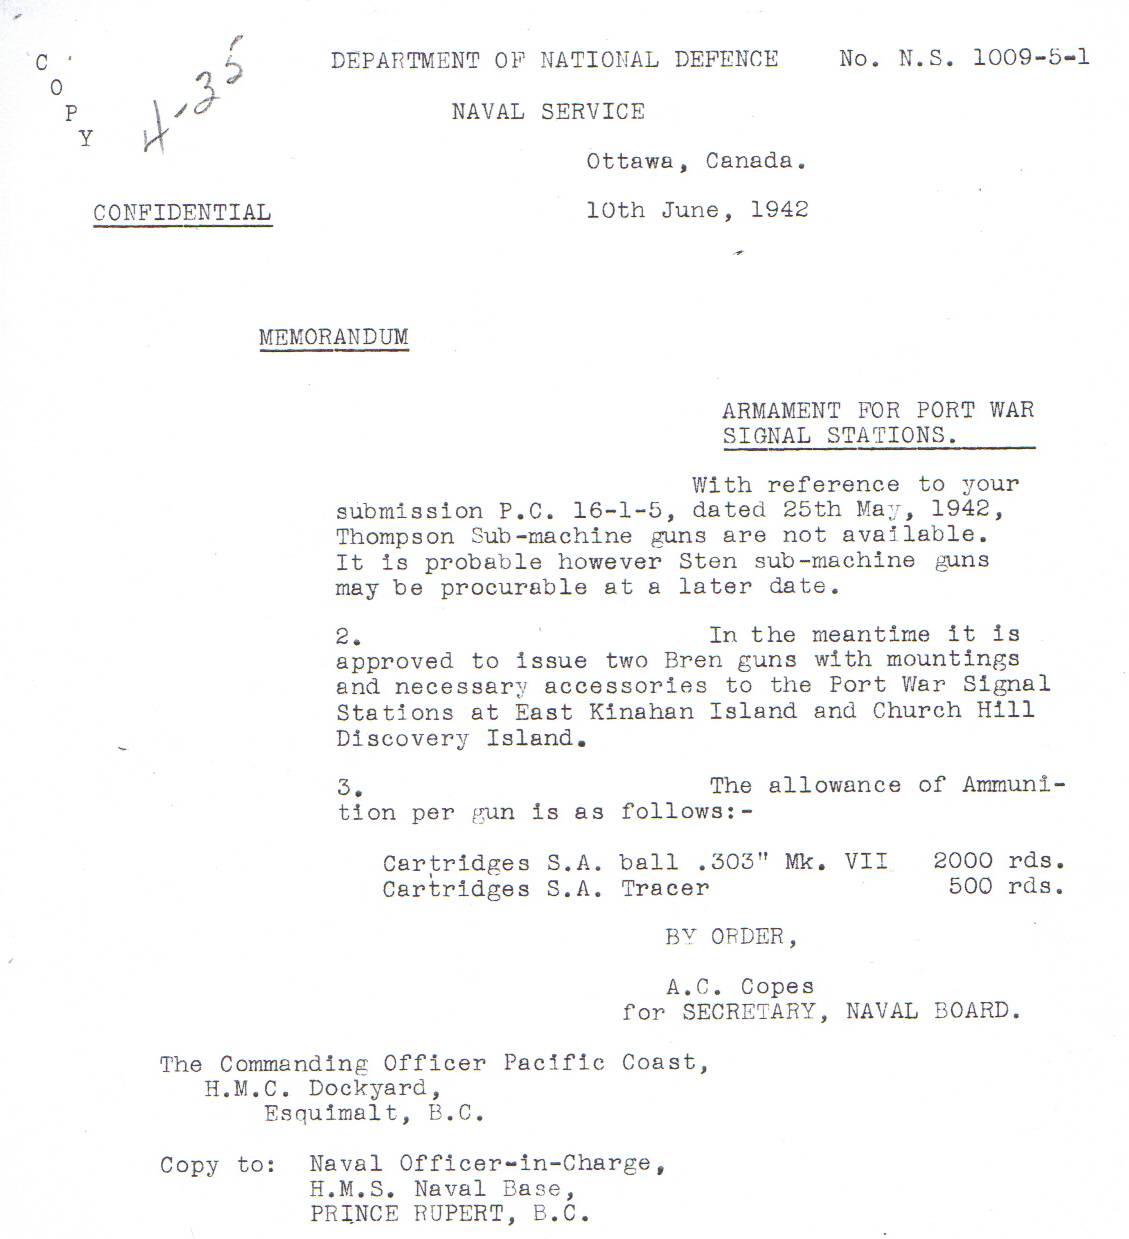 WW2 signal station requesting a machine gun. 1942